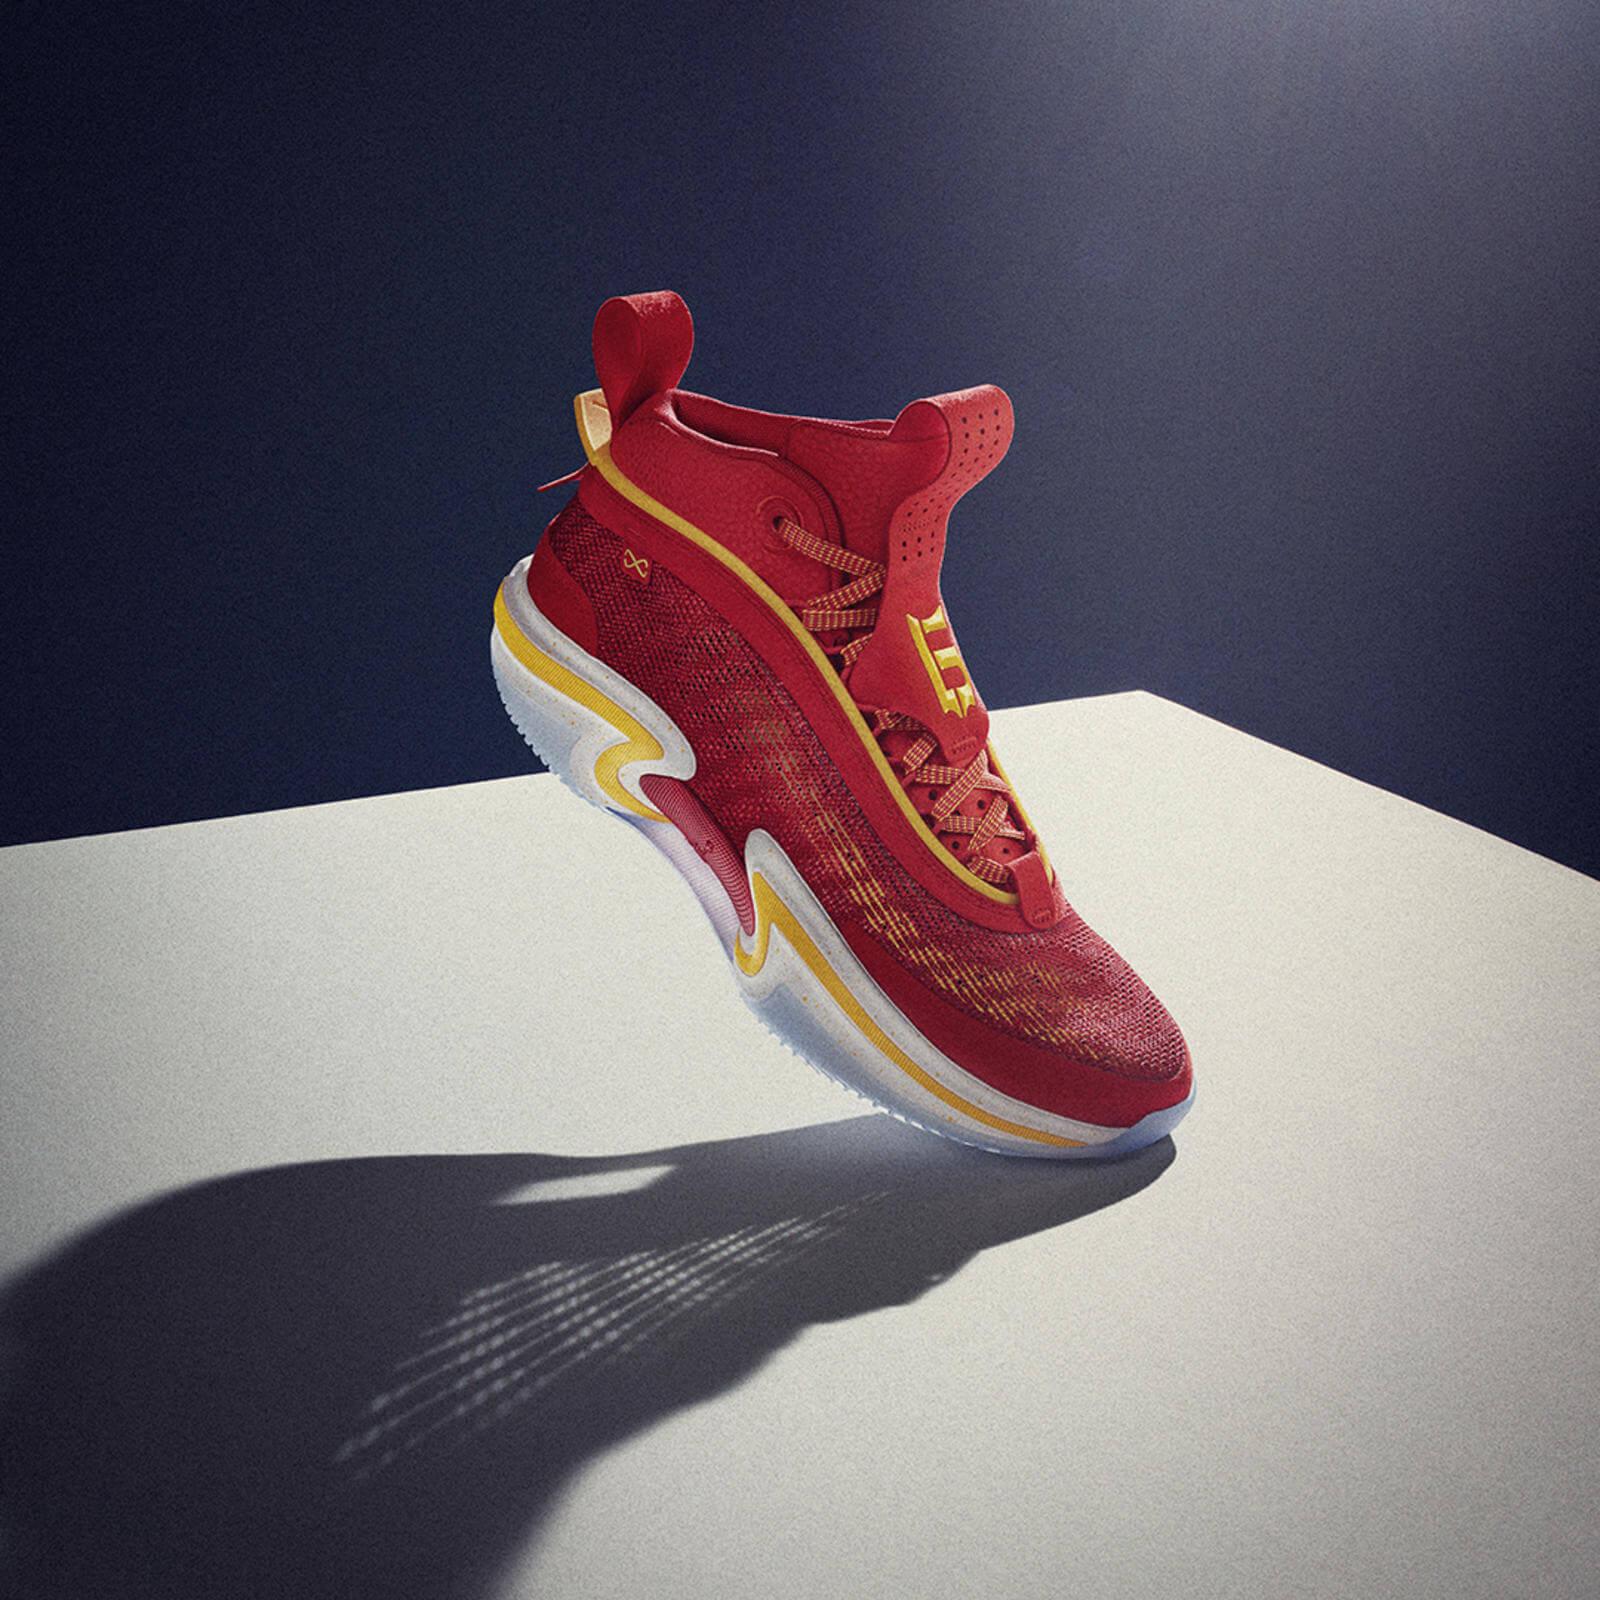 Nike Air Jordan XXXVI36 - Global Game - Guo Ailun - red yellow white